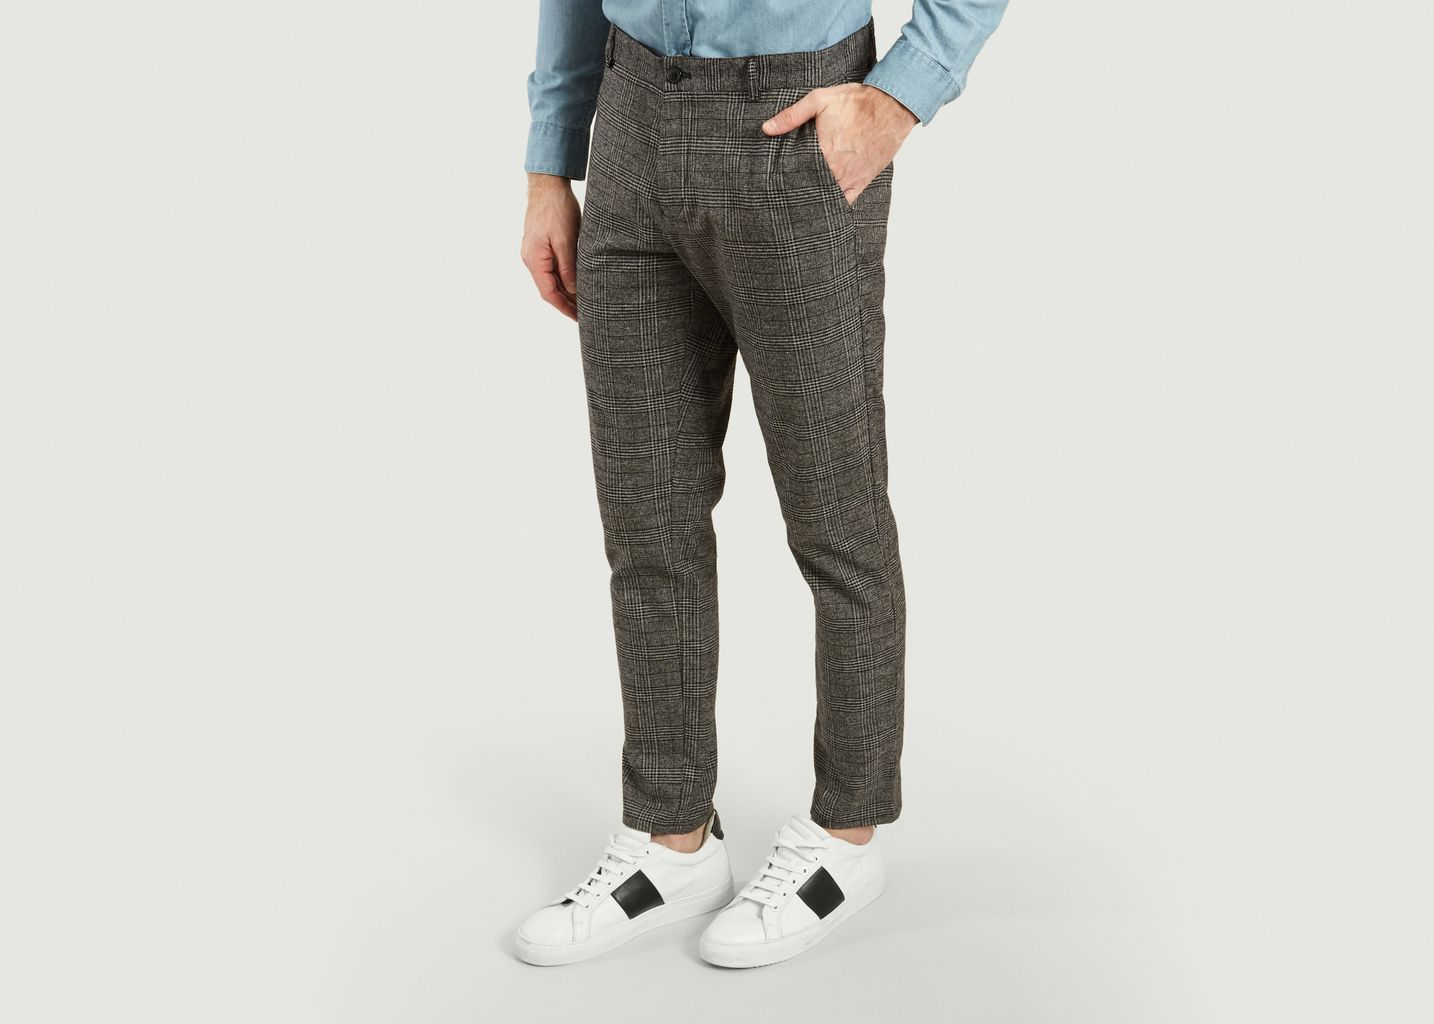 Pantalon Frankie Motif Prince-De-Galles - Samsoe Samsoe